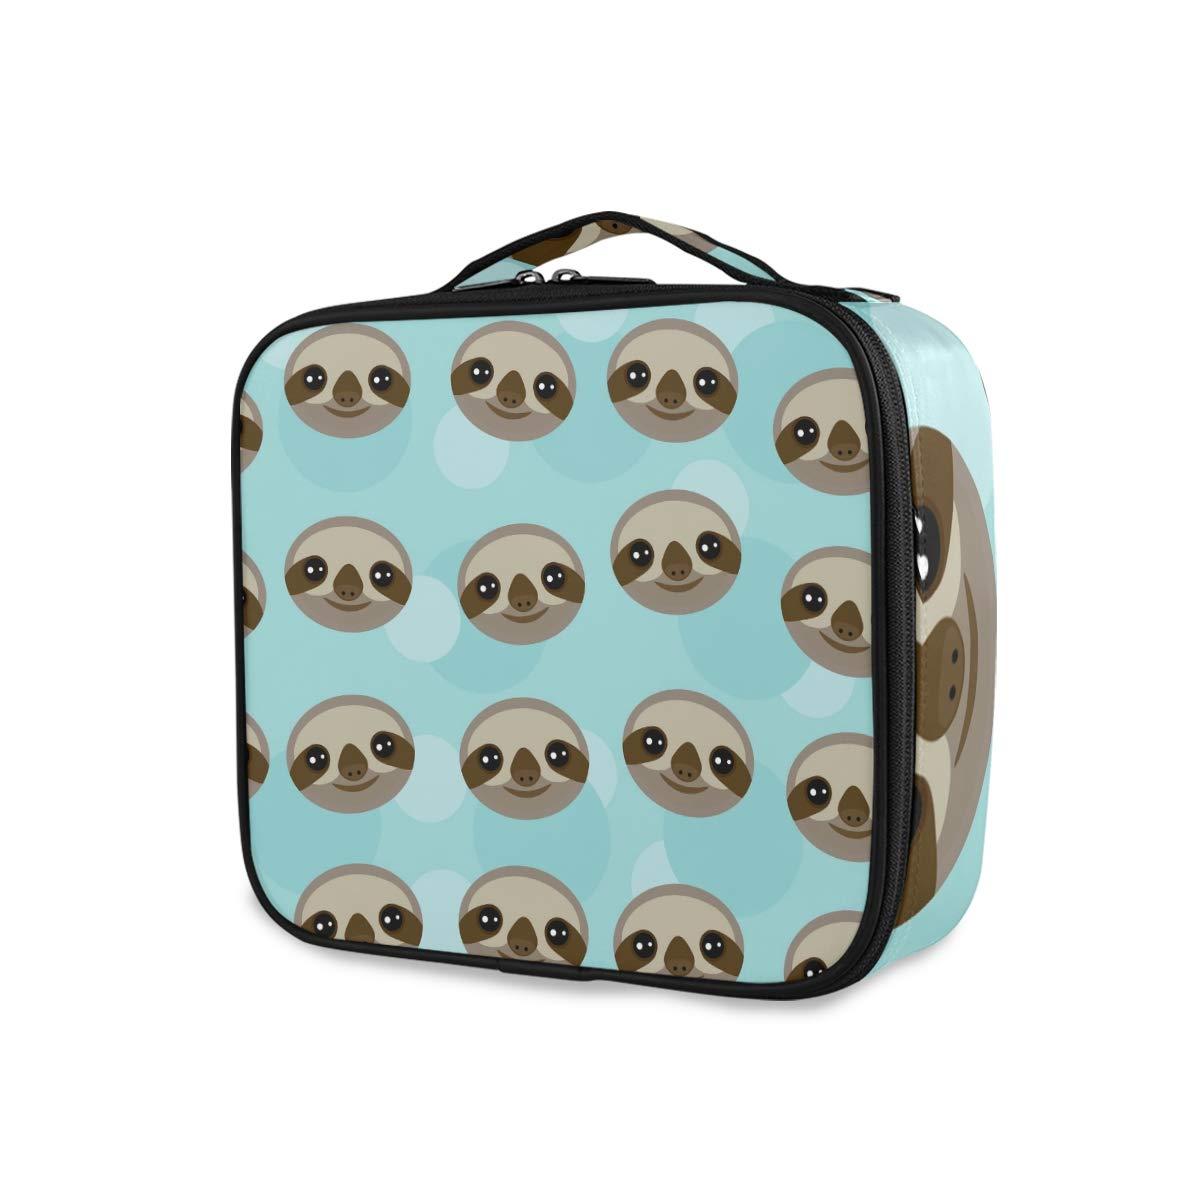 ALAZA Travel Makeup Case, Three-Toed Sloth Muzzle Professional Cosmetic Makeup Bag Organizer Makeup Boxes